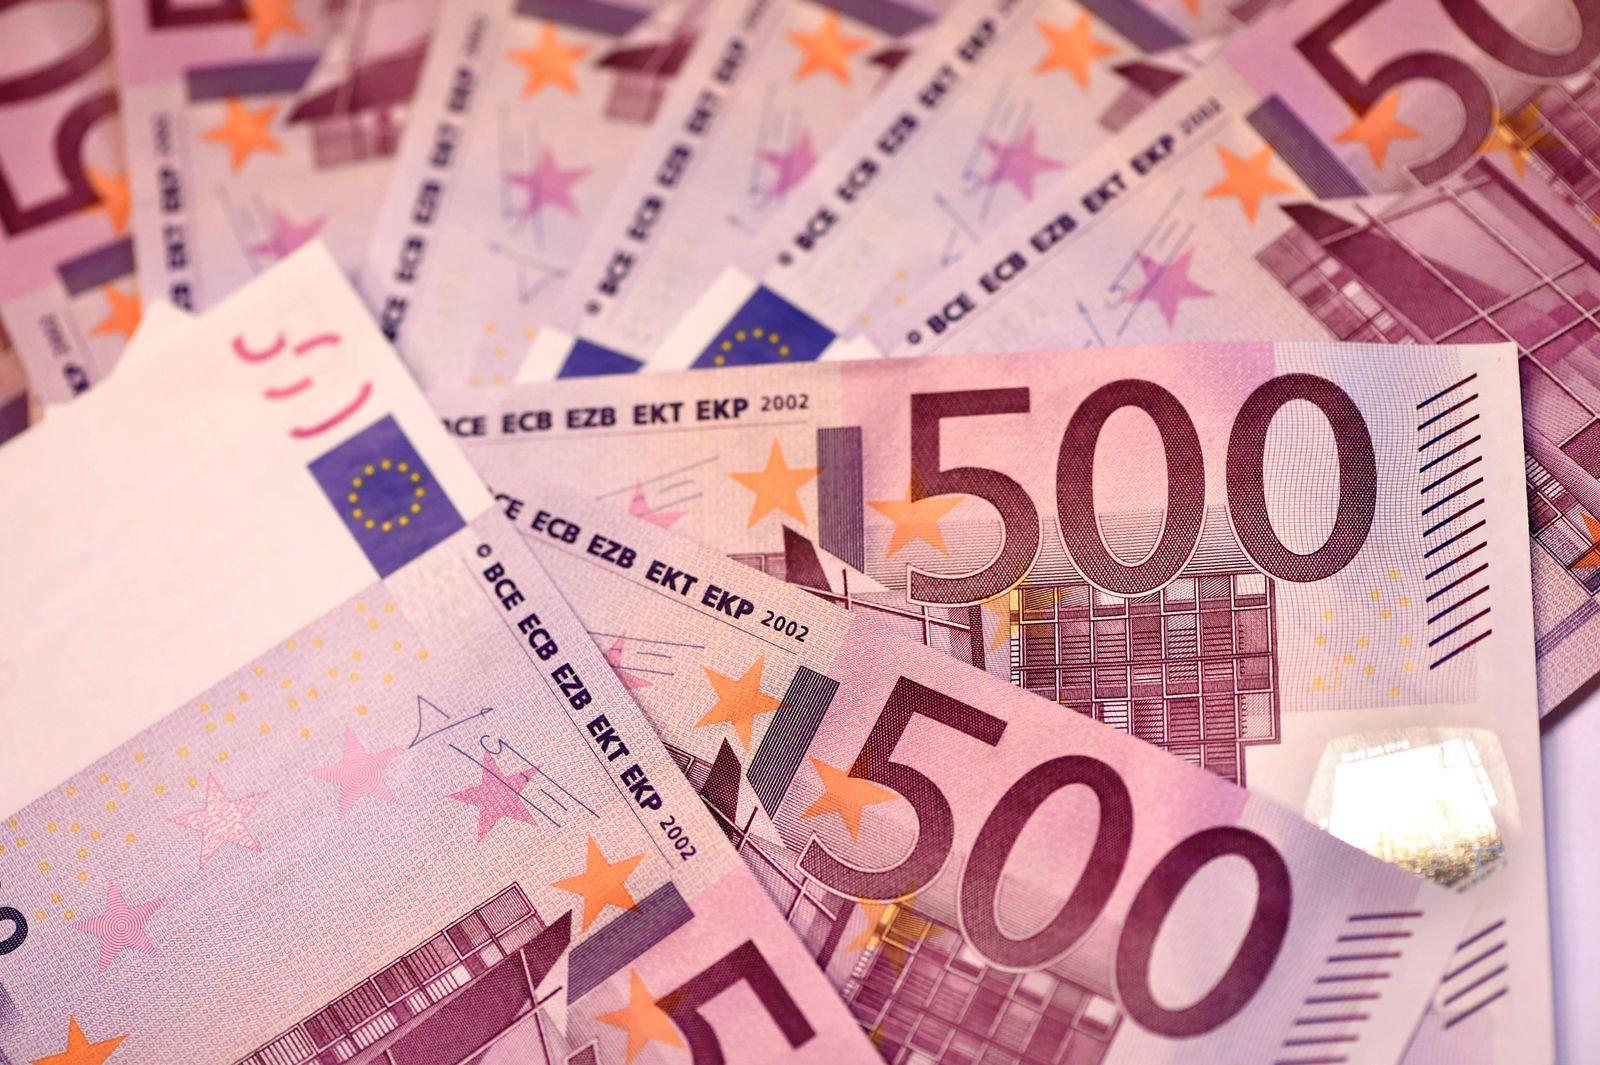 FRANCE-ECB-EURO-BANKNOTES